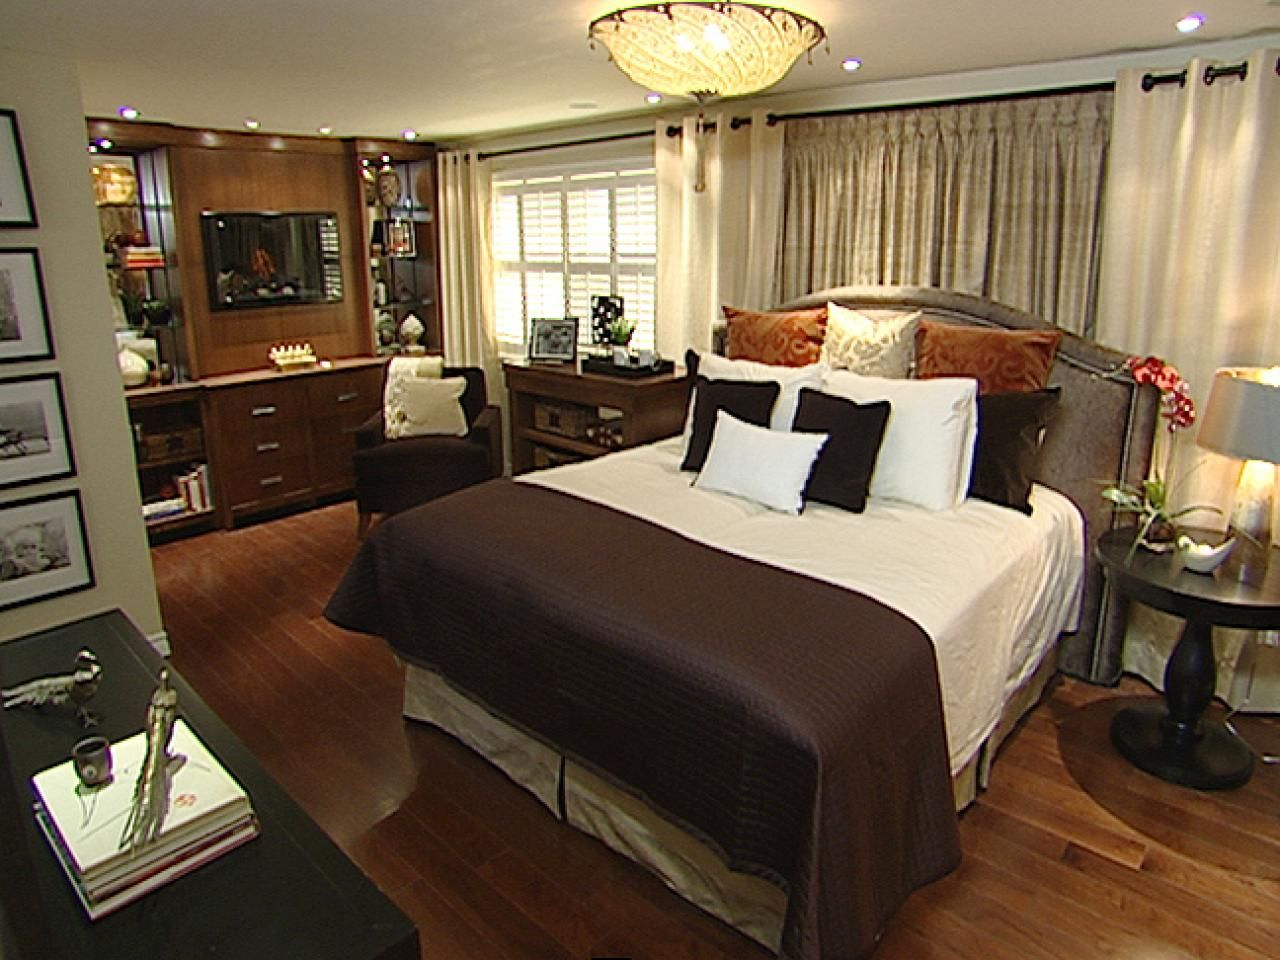 10 Bedroom Retreats From Candice Olson Bedroom Decor Bedroom